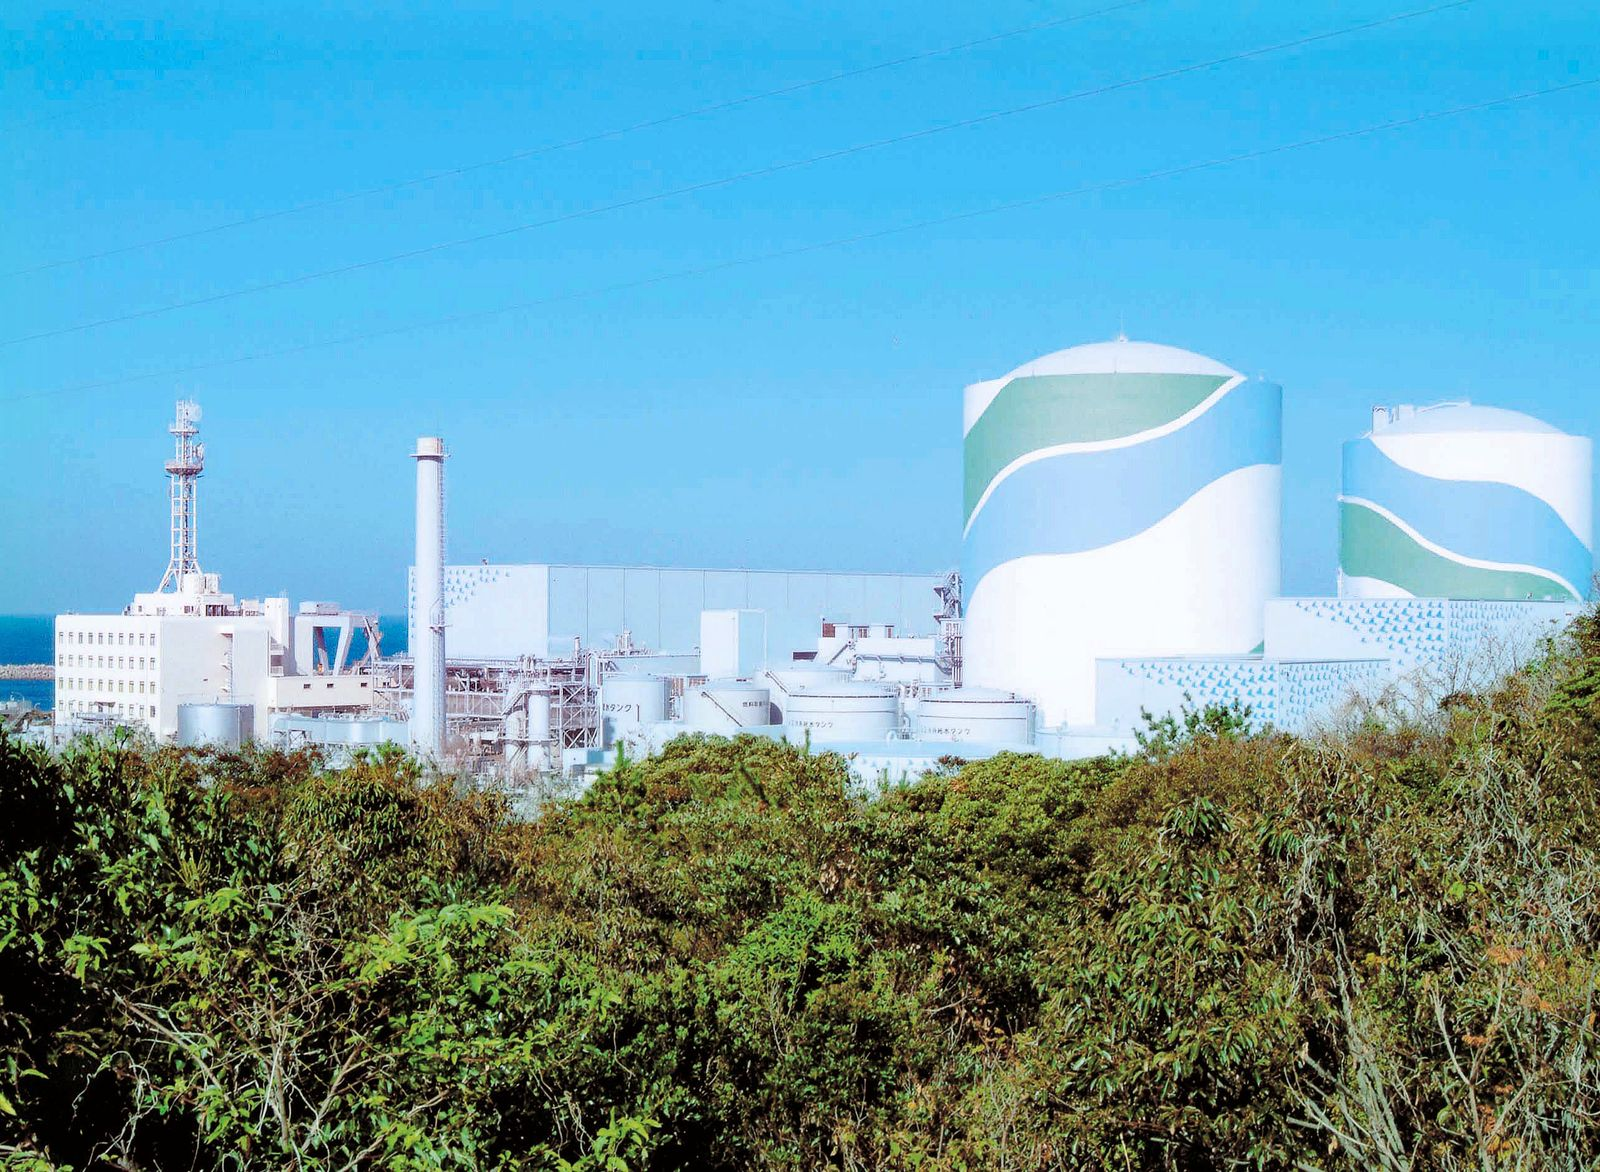 Atomkraftwerk Sendai / Japan